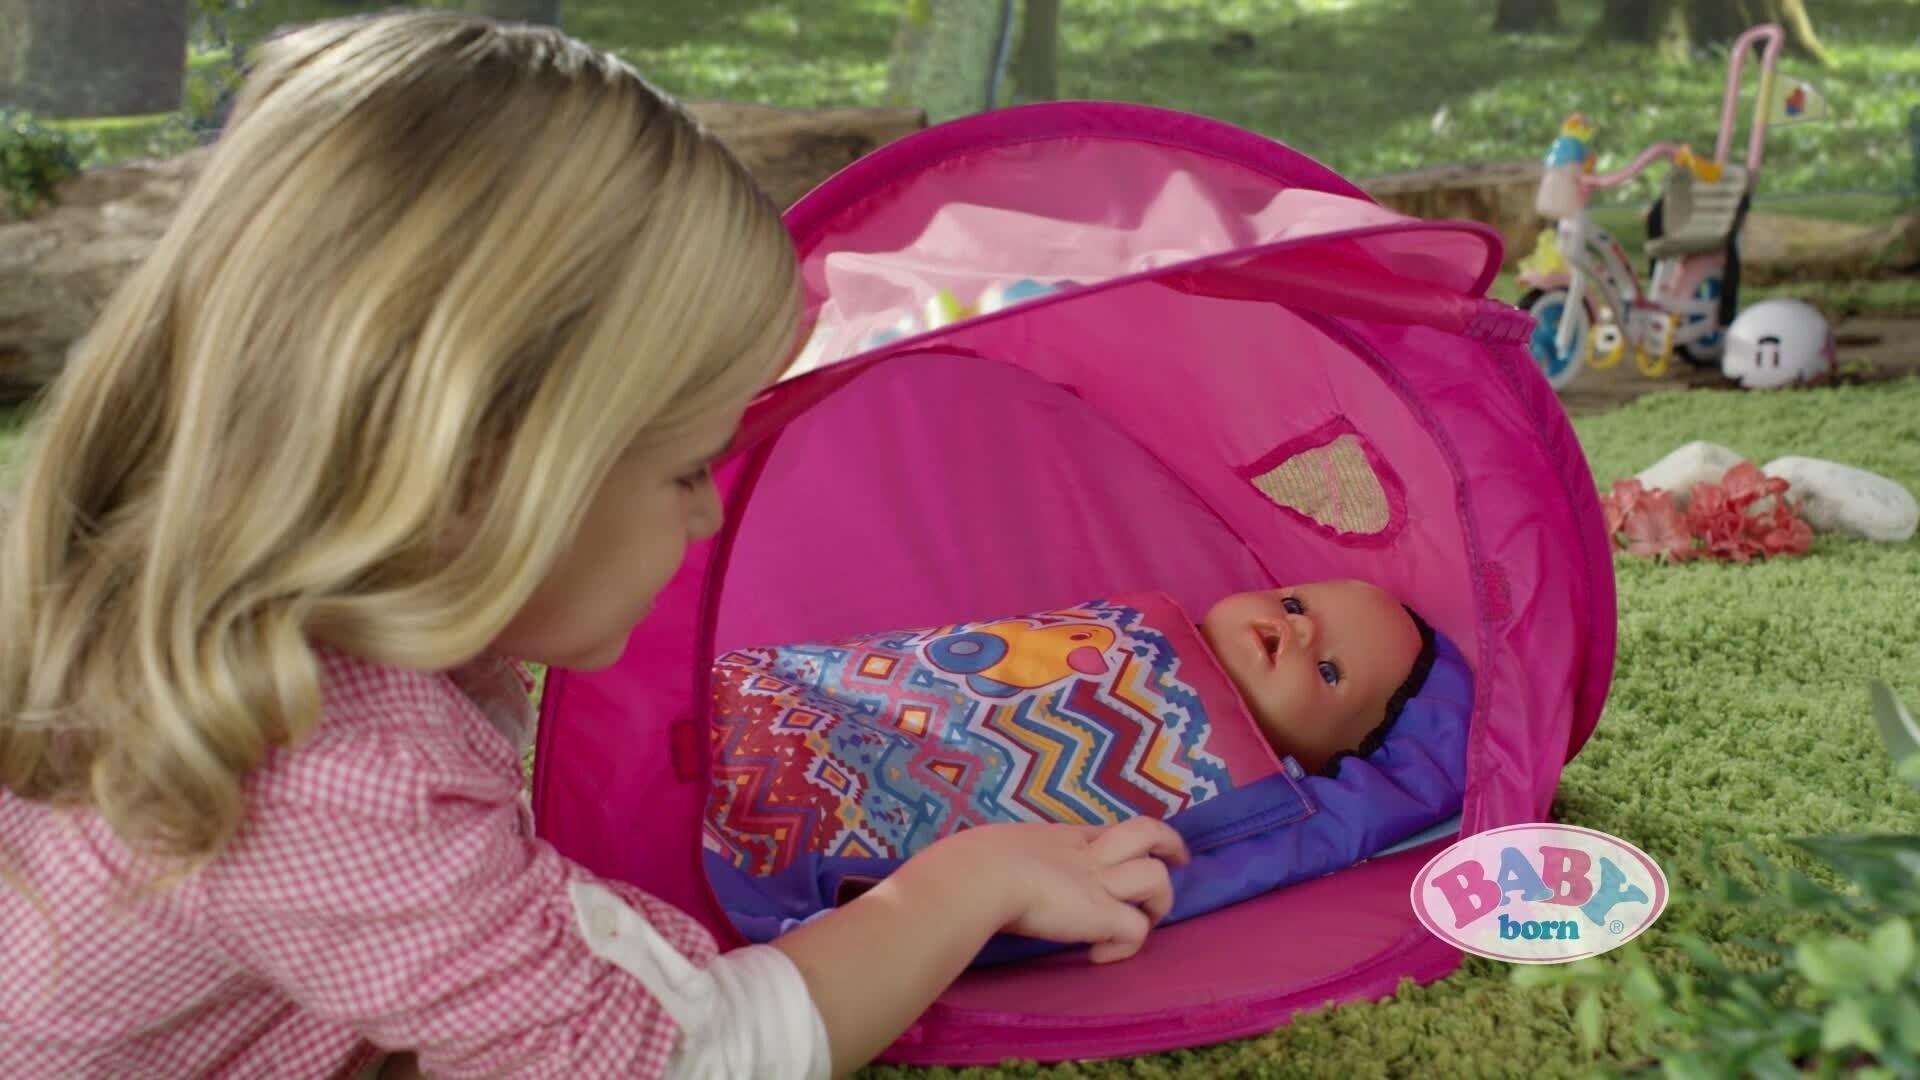 BABY born® Play&Fun Camping Set